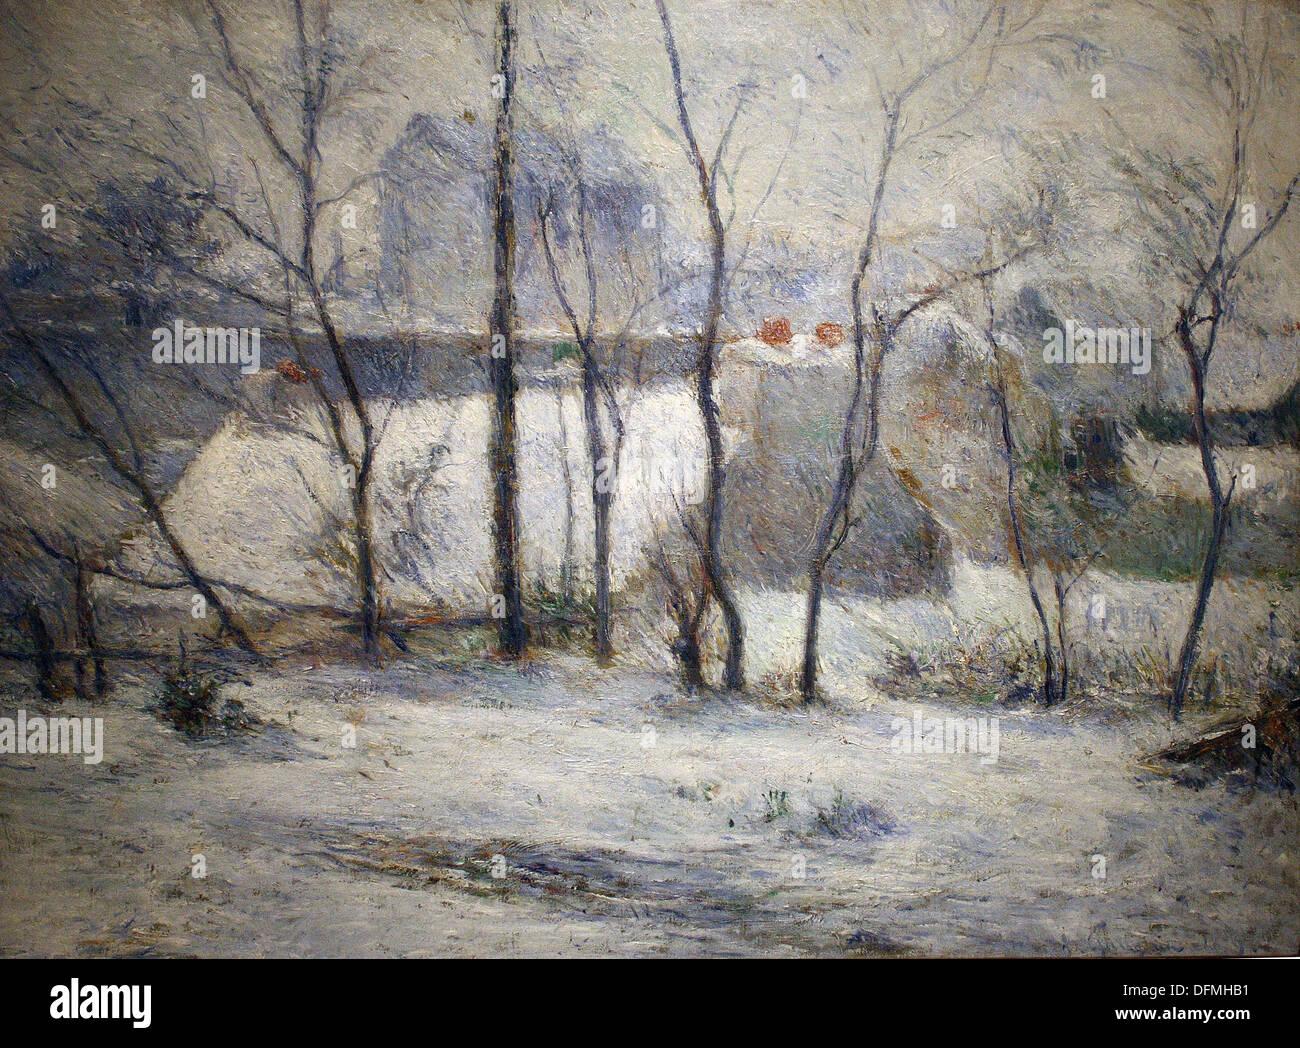 Paul GAUGIN - Garden under snow - 1879 - Museum of Fine Arts - Budapest, Hungary - Stock Image